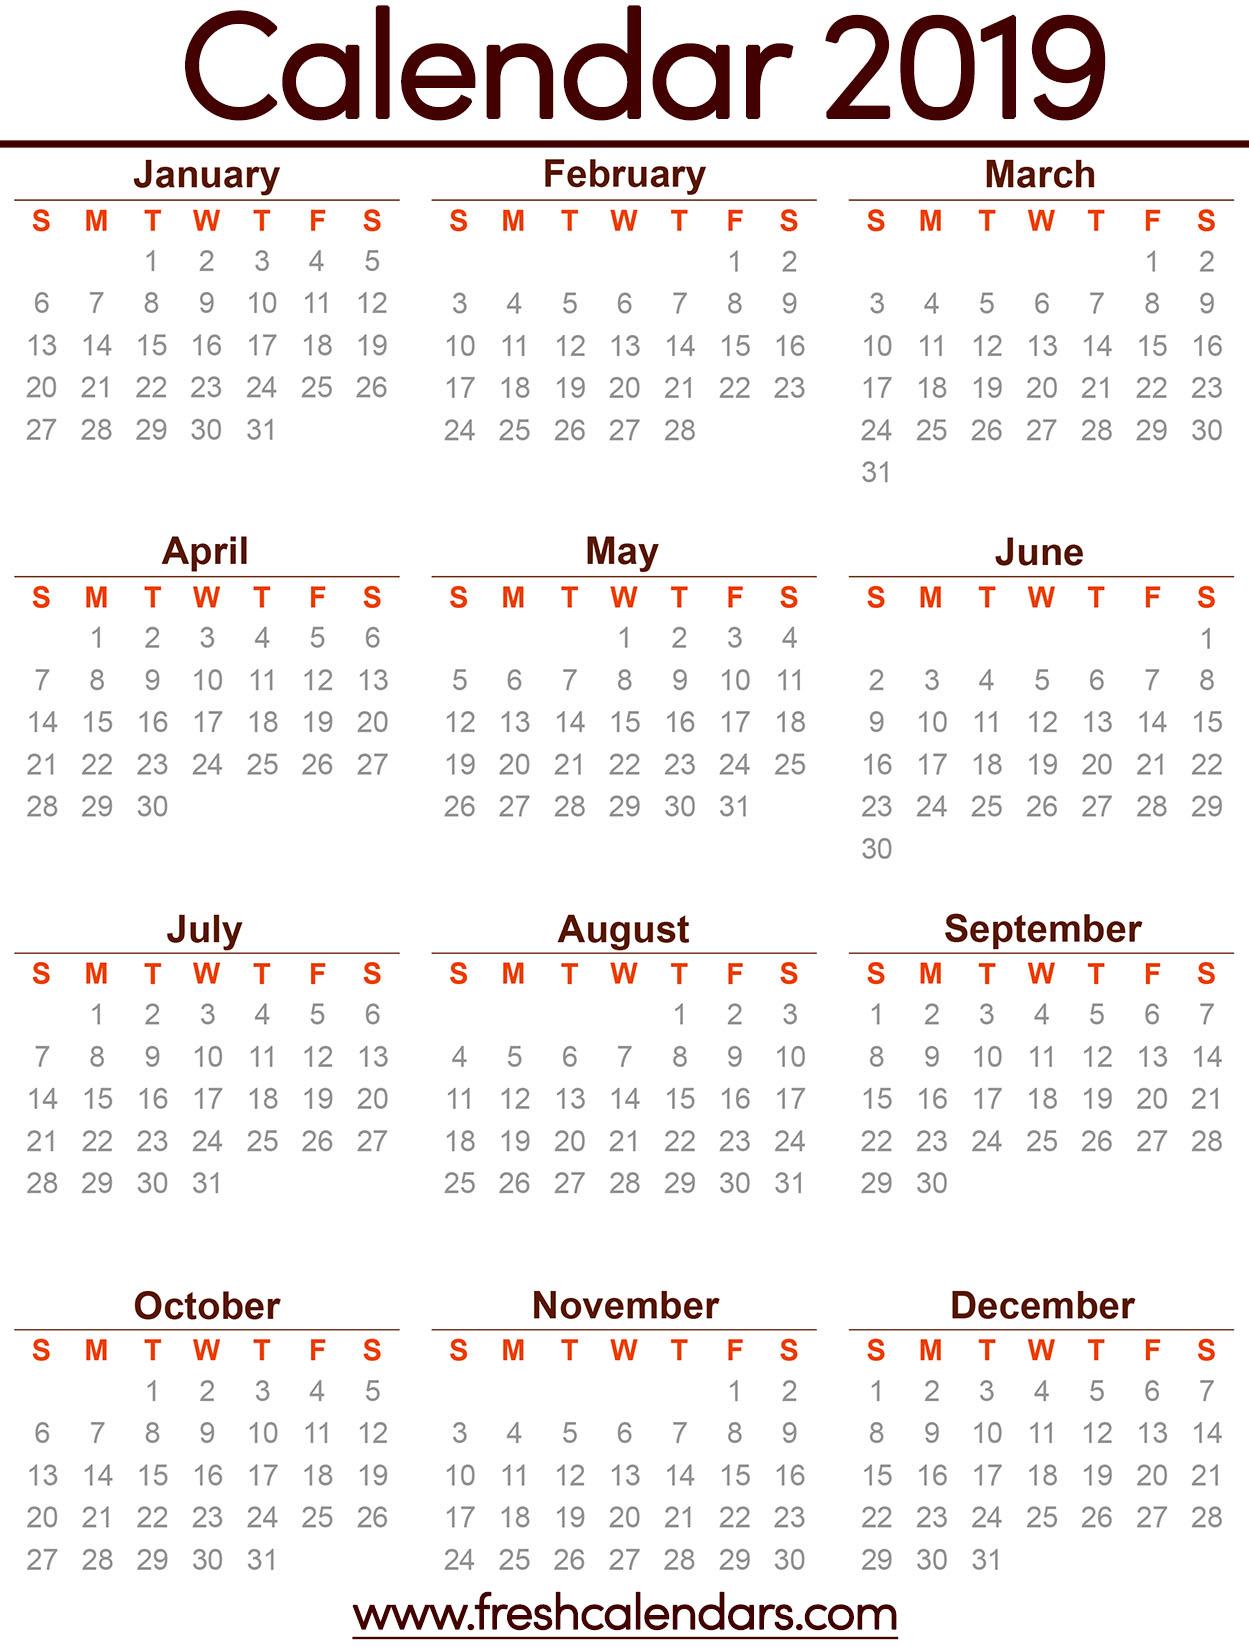 2019 Calendar throughout Printable Calendars July 2019 To June 2020